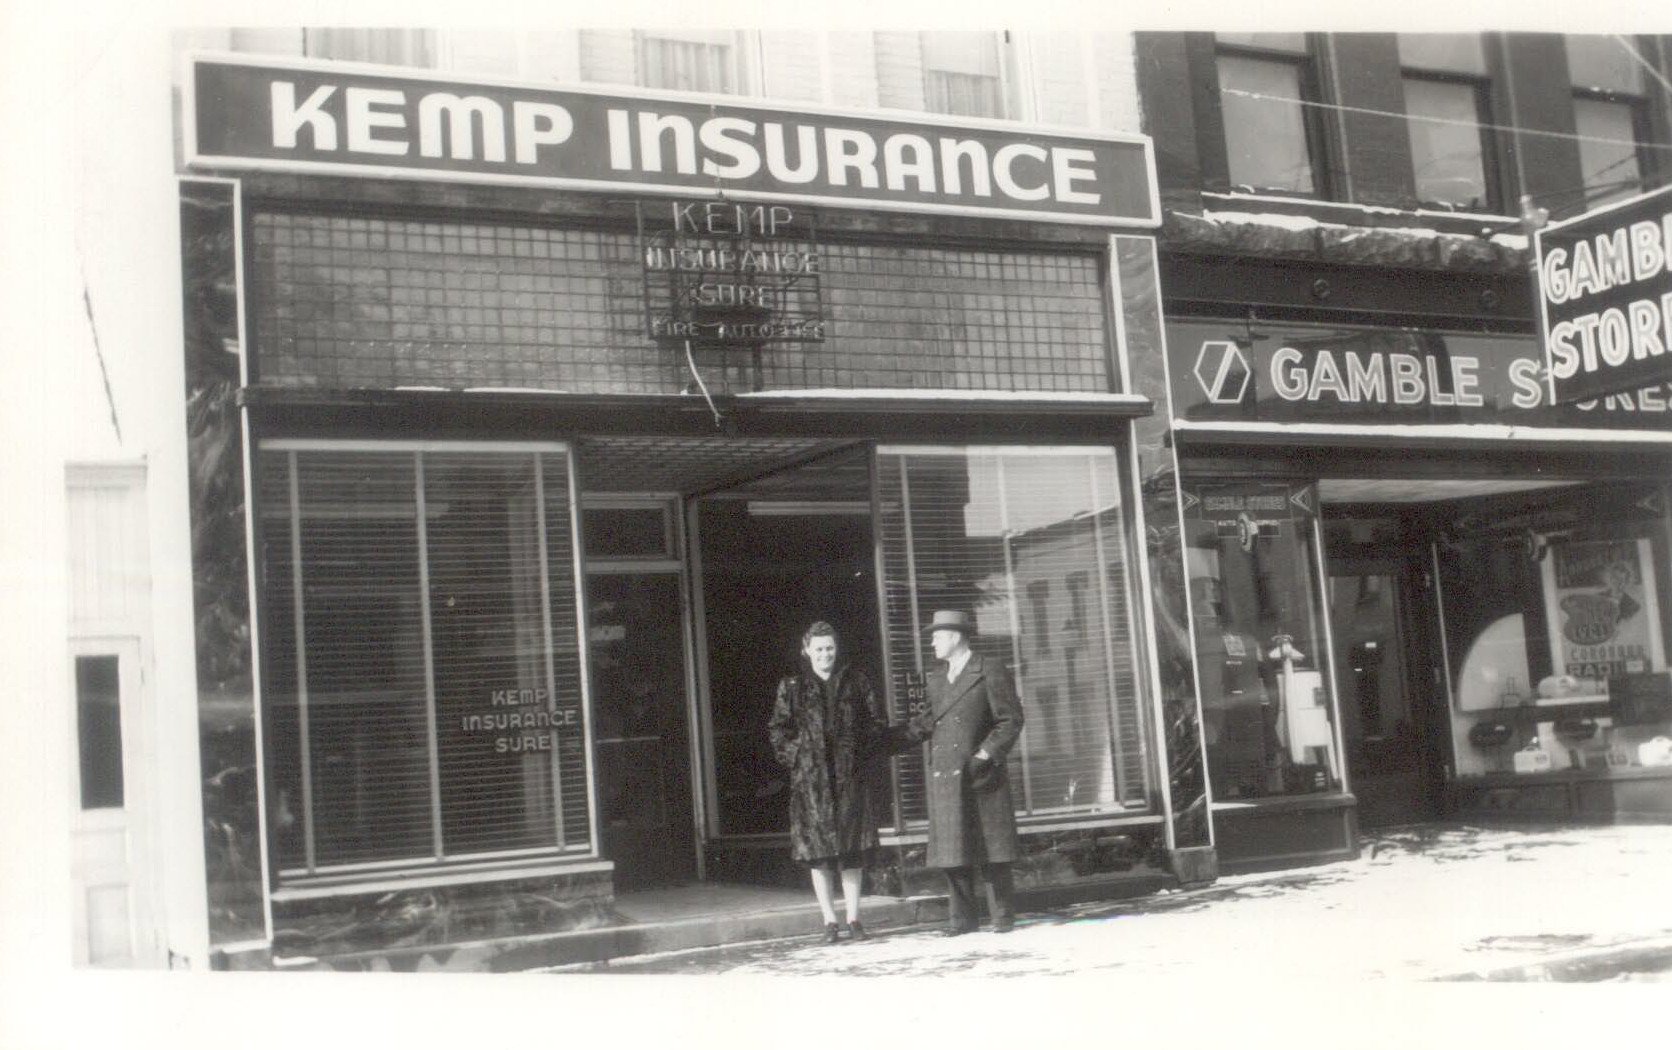 Kemp Insurance 307 S. Lafayette, 1944.